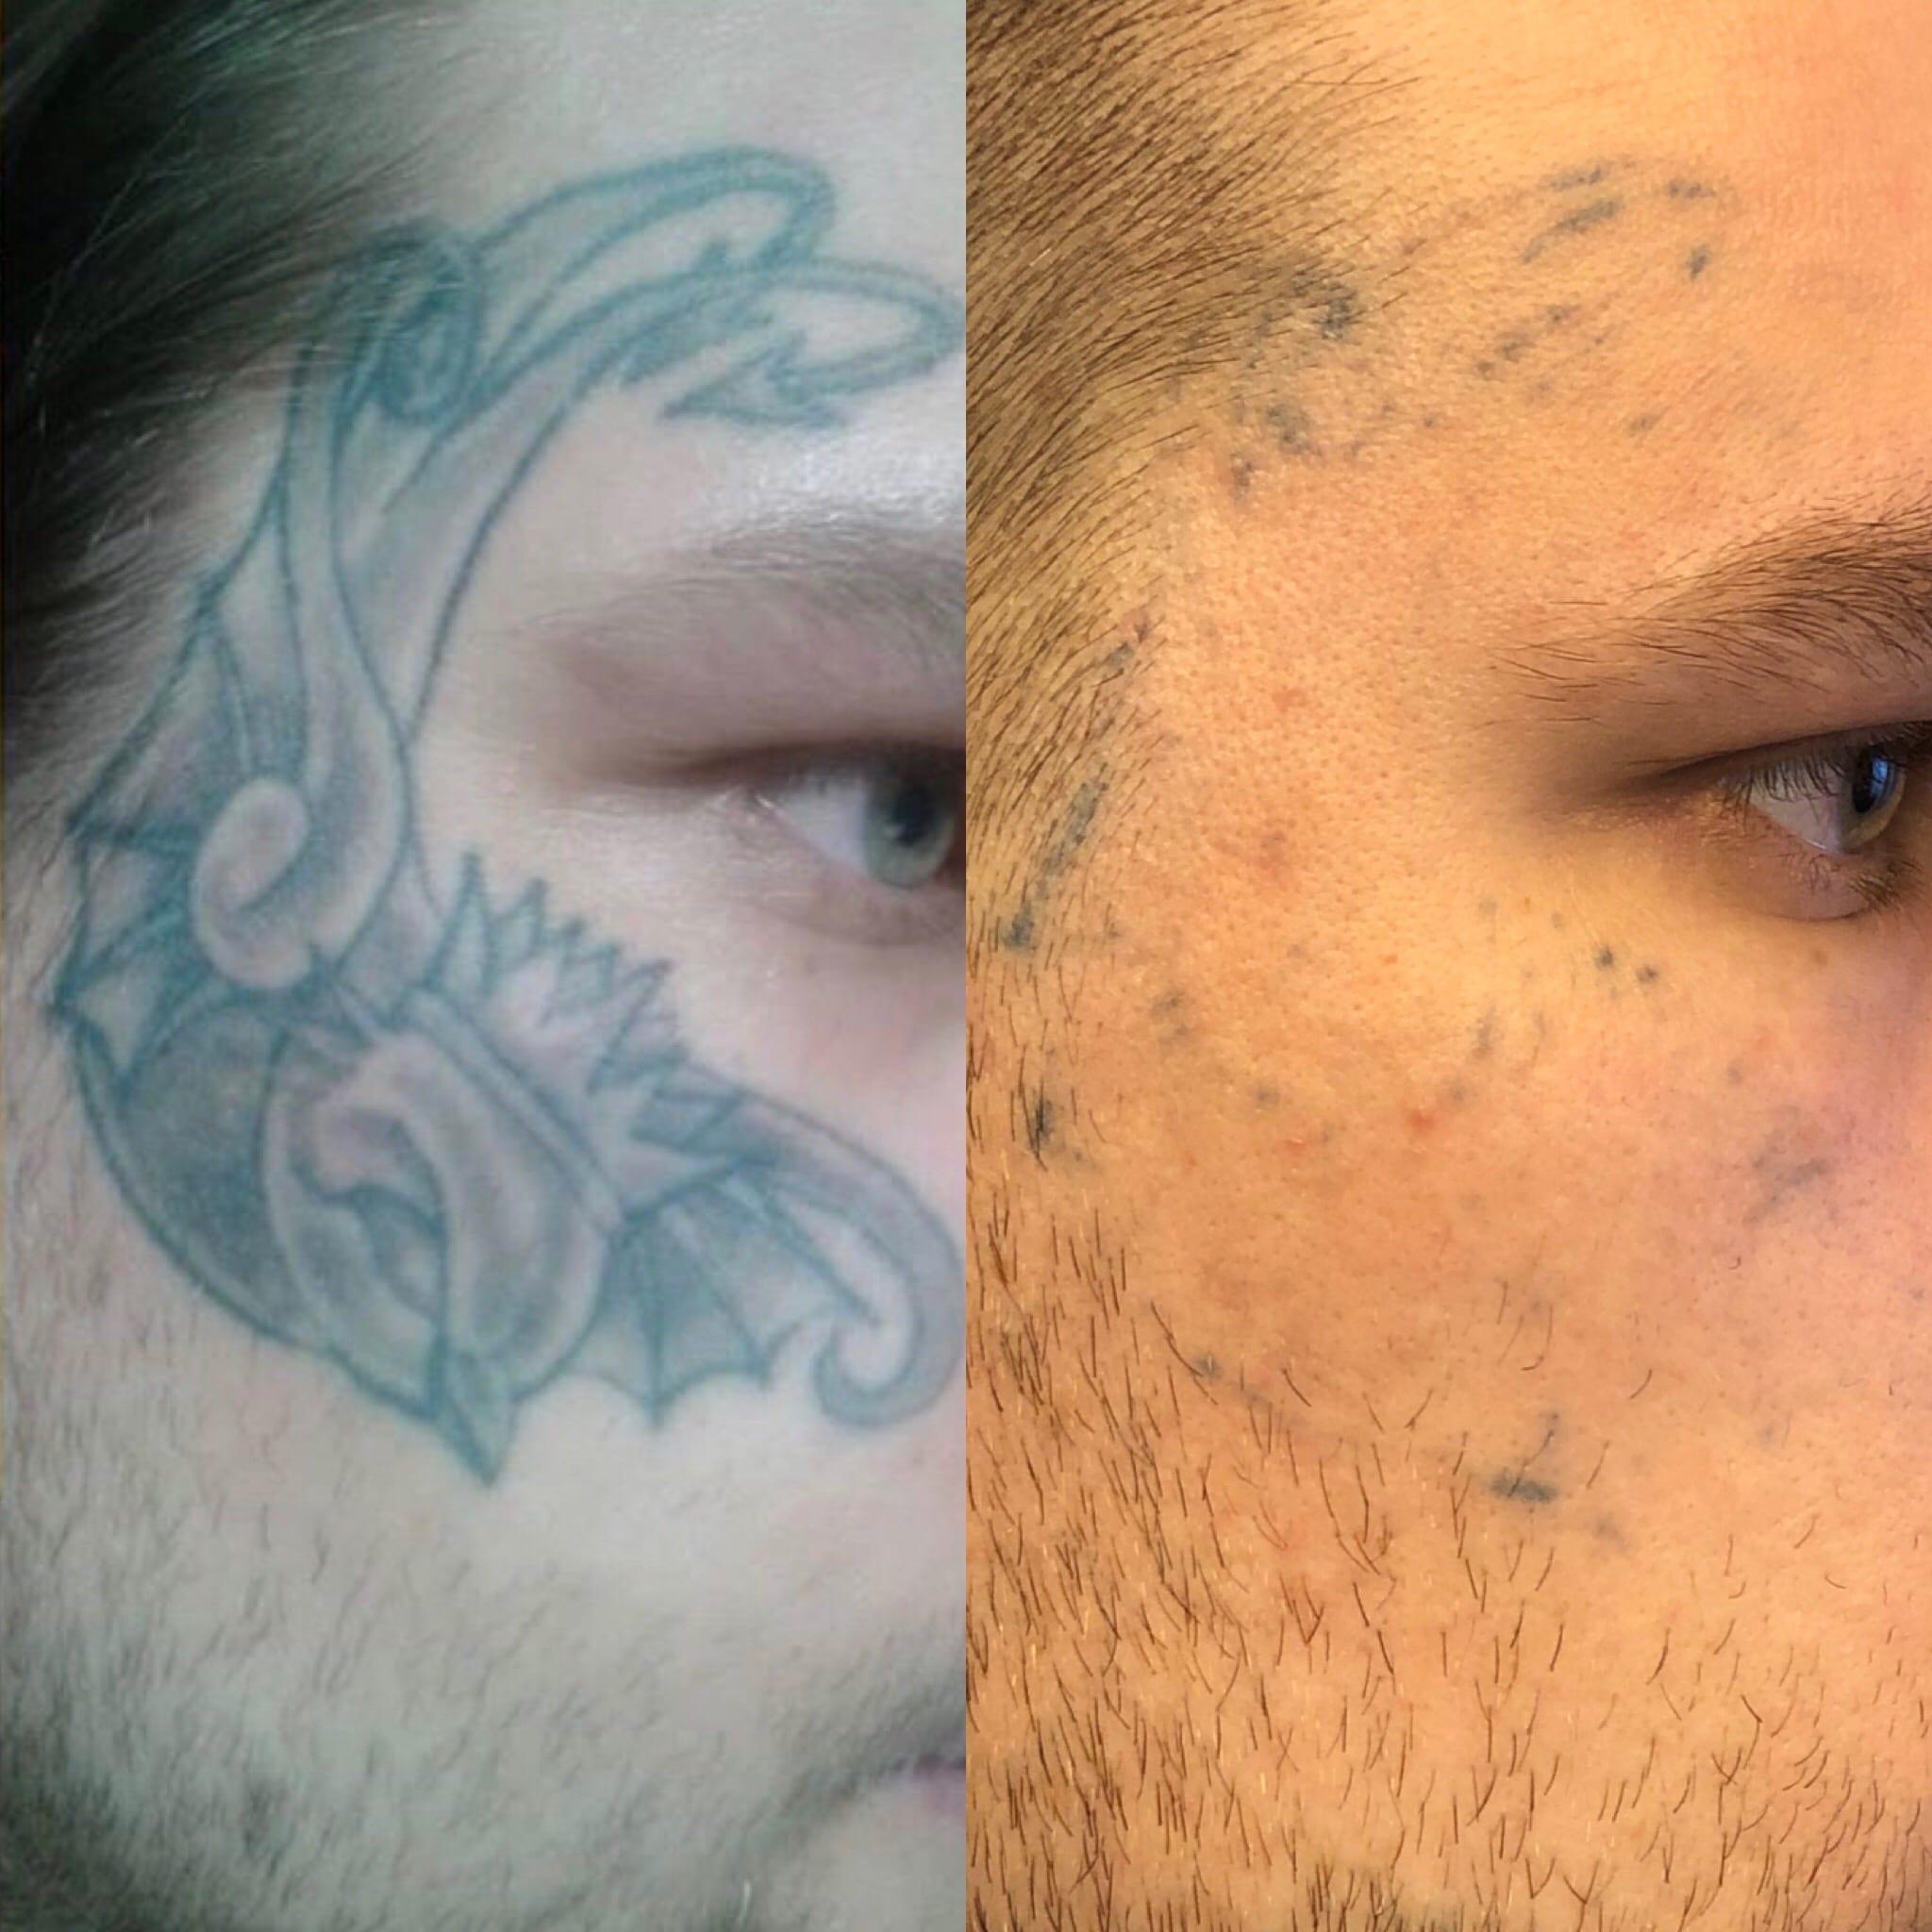 operera bort tatuering